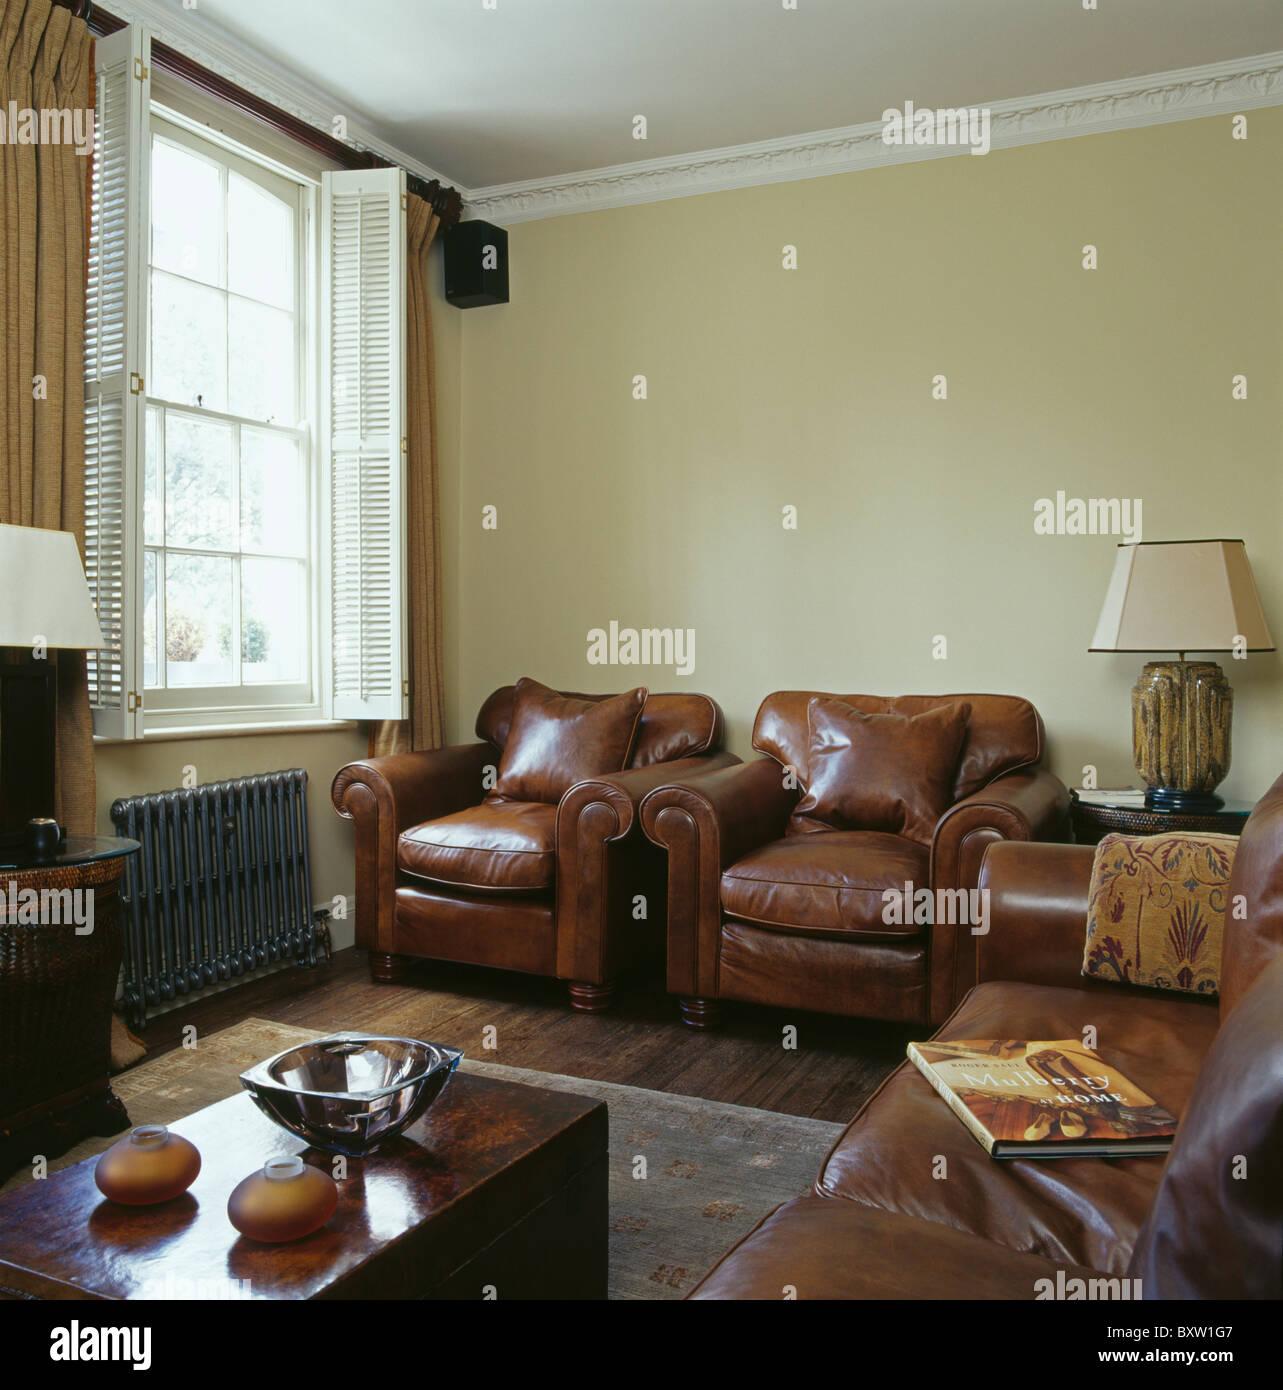 Cream sofas stockfotos cream sofas bilder seite 2 alamy for Braune ledersessel